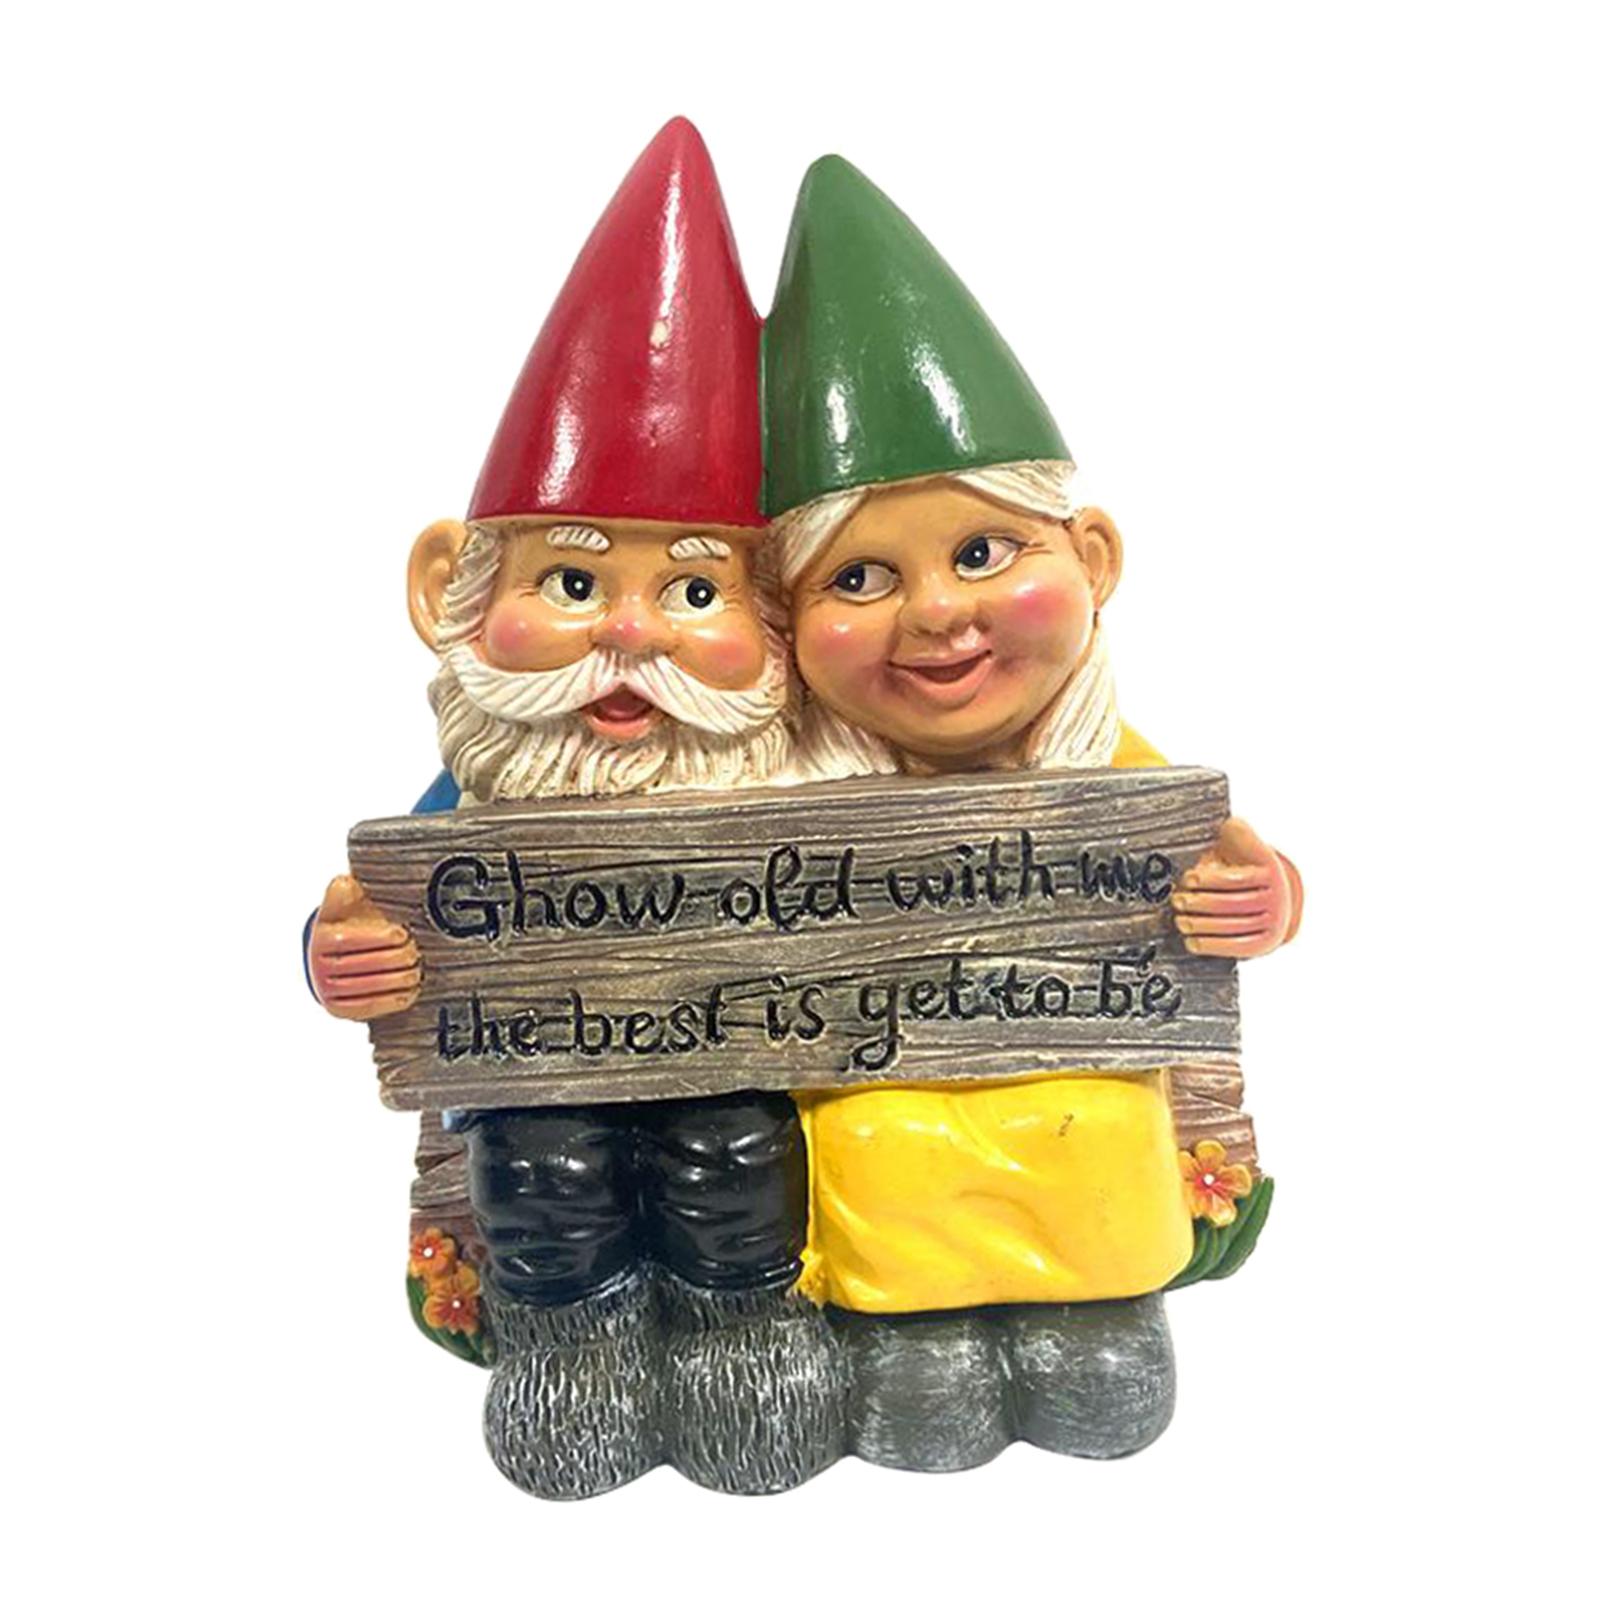 thumbnail 28 - Funny Resin Naughty Garden Gnome Statue Ornaments Villa Home Figurines Decor